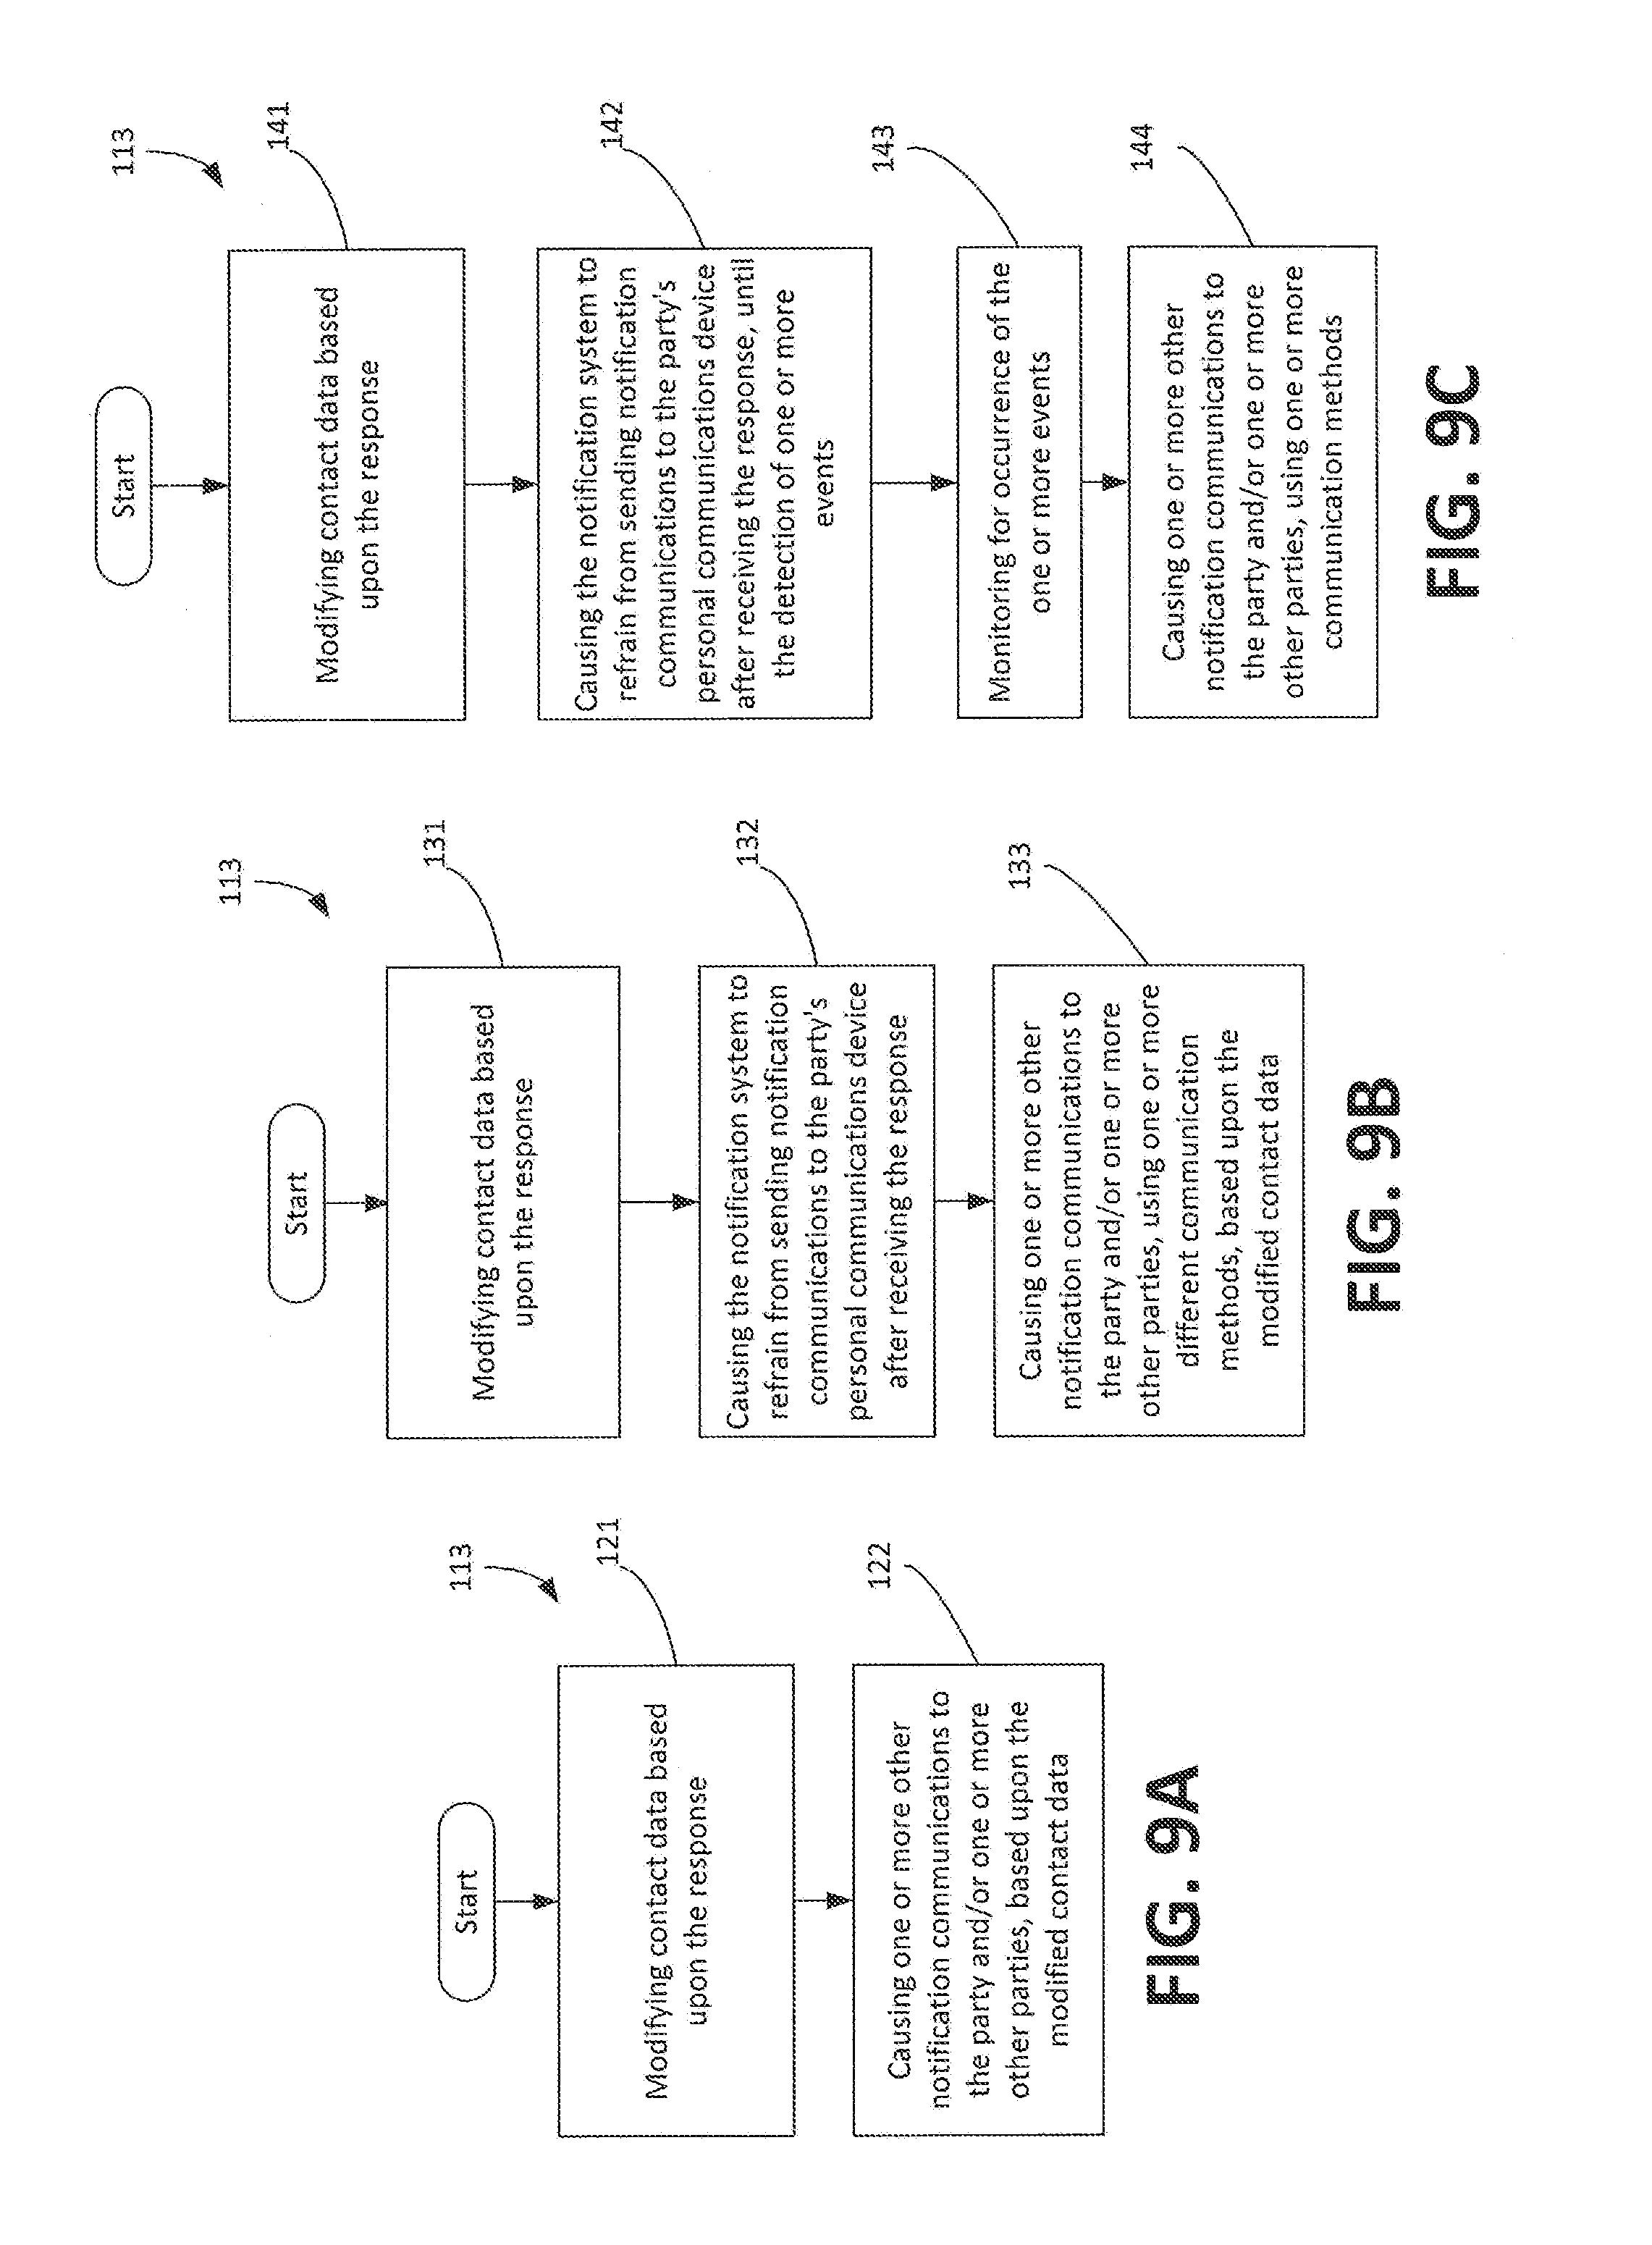 Patent US 9,373,261 B2